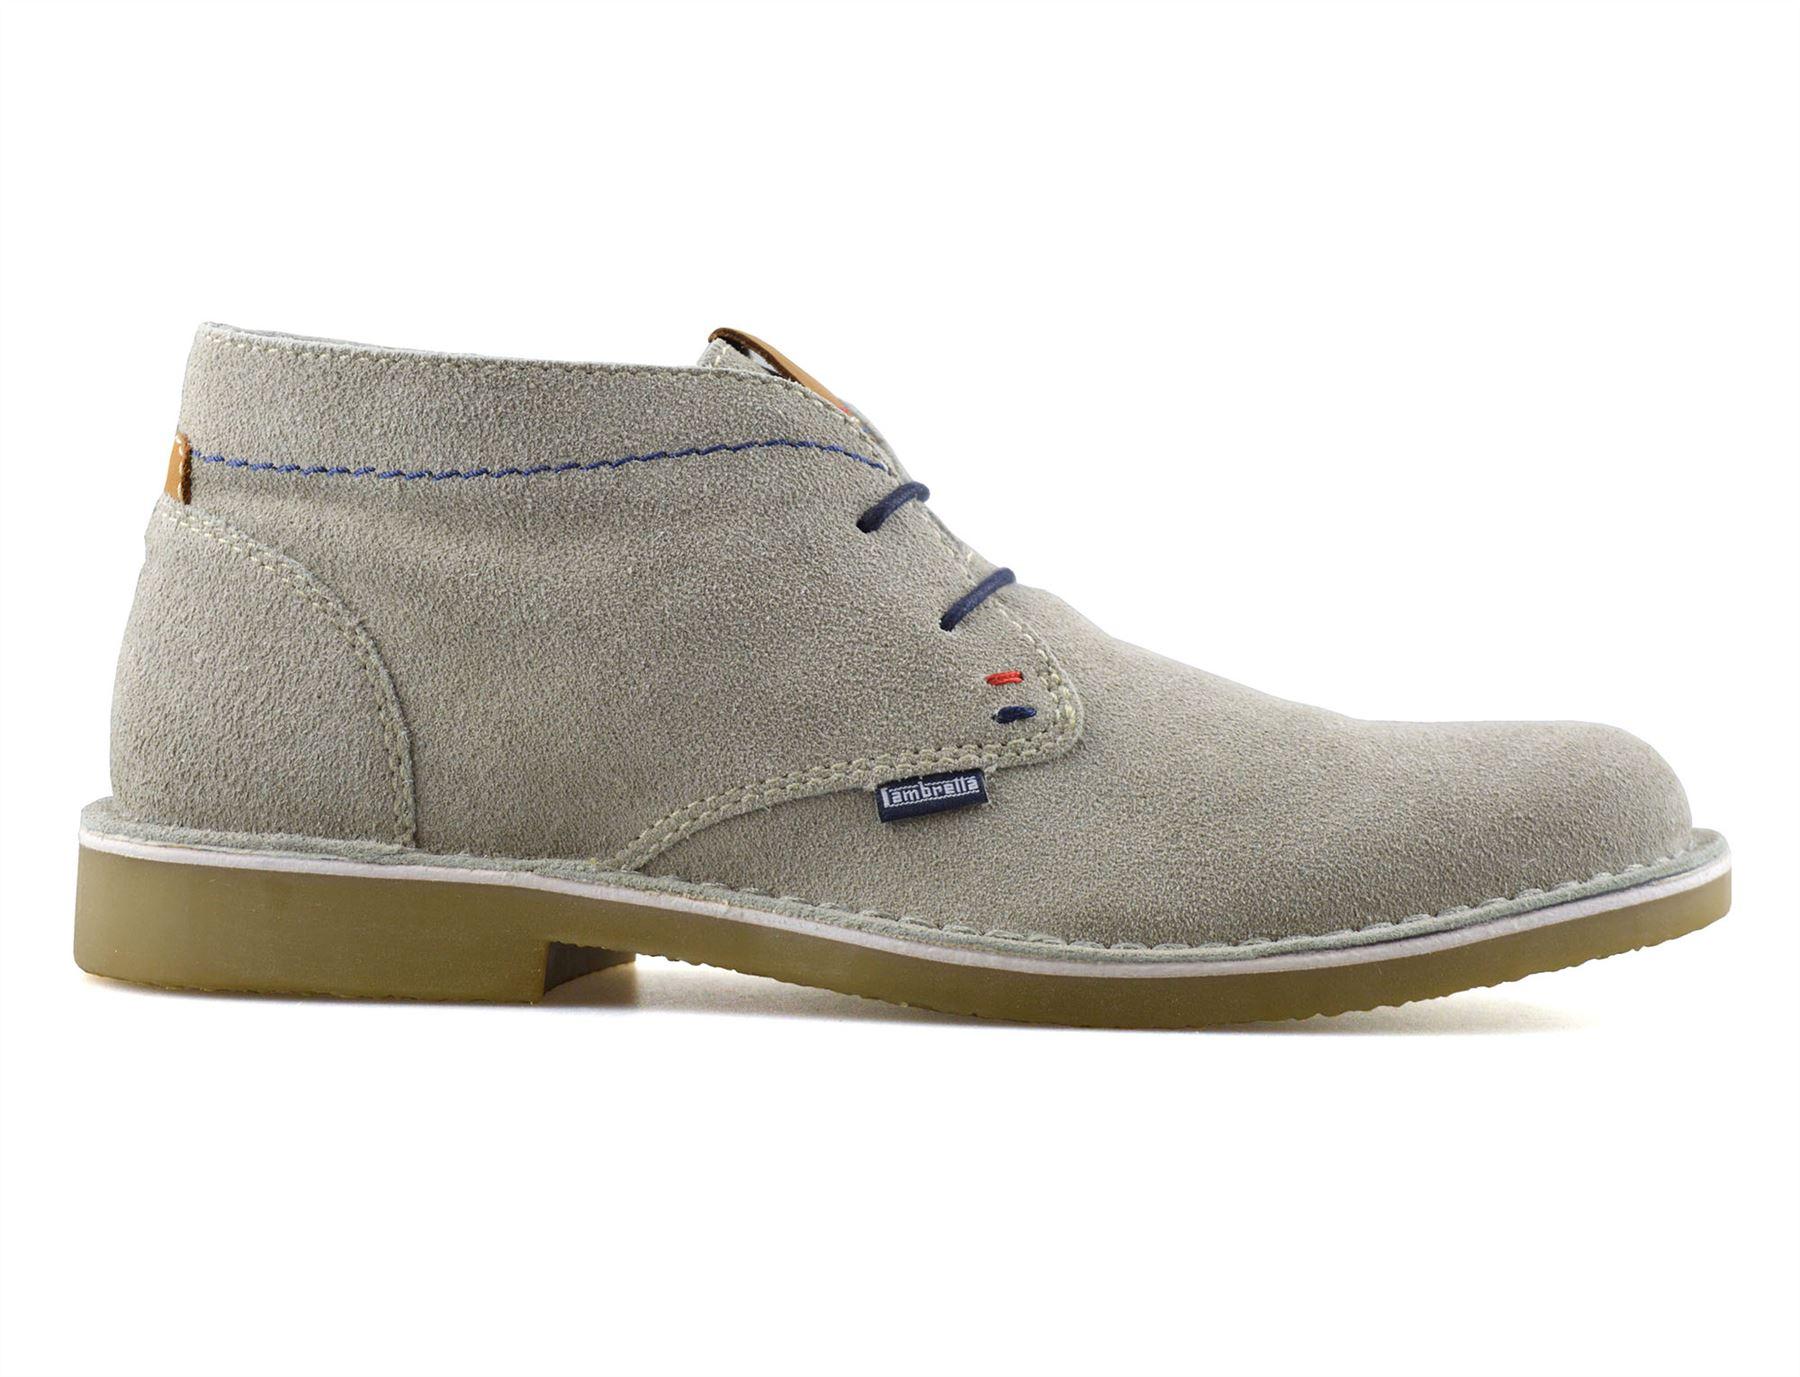 Homme-Lambretta-Cuir-Daim-Decontracte-Chukka-a-Lacets-Desert-Bottes-Chaussures-Taille miniature 8